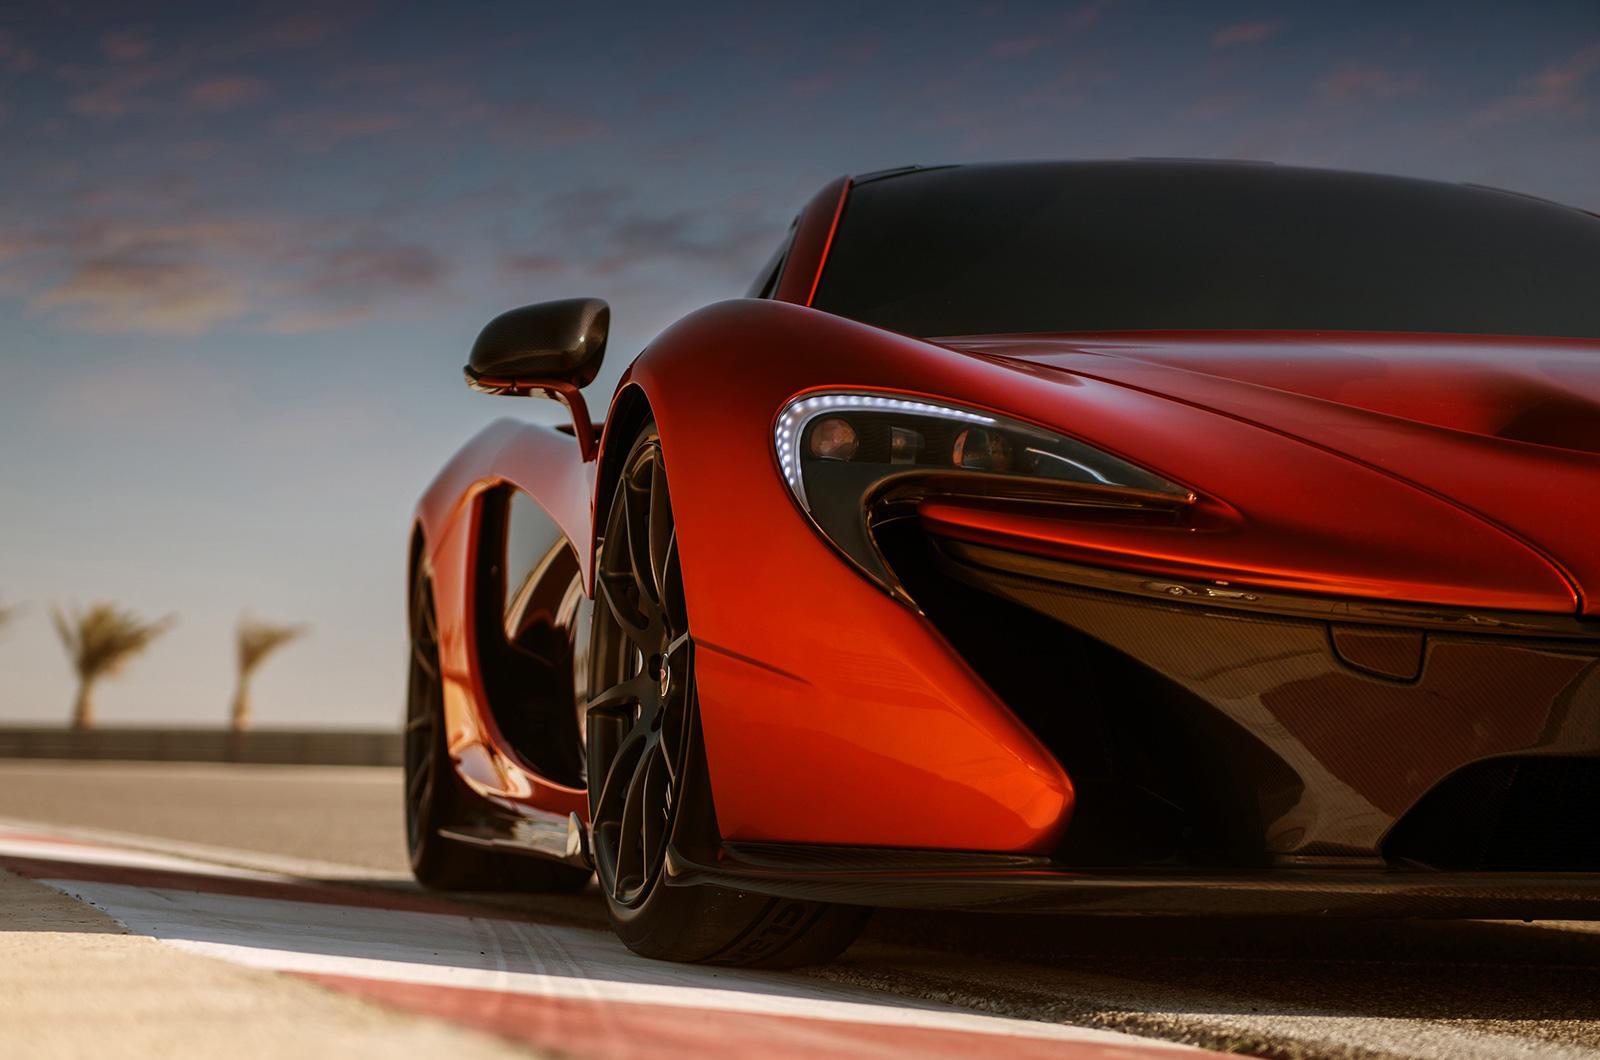 P1, 2014 McLaren P1, McLaren P1 specs, McLaren P1 design, McLaren P1